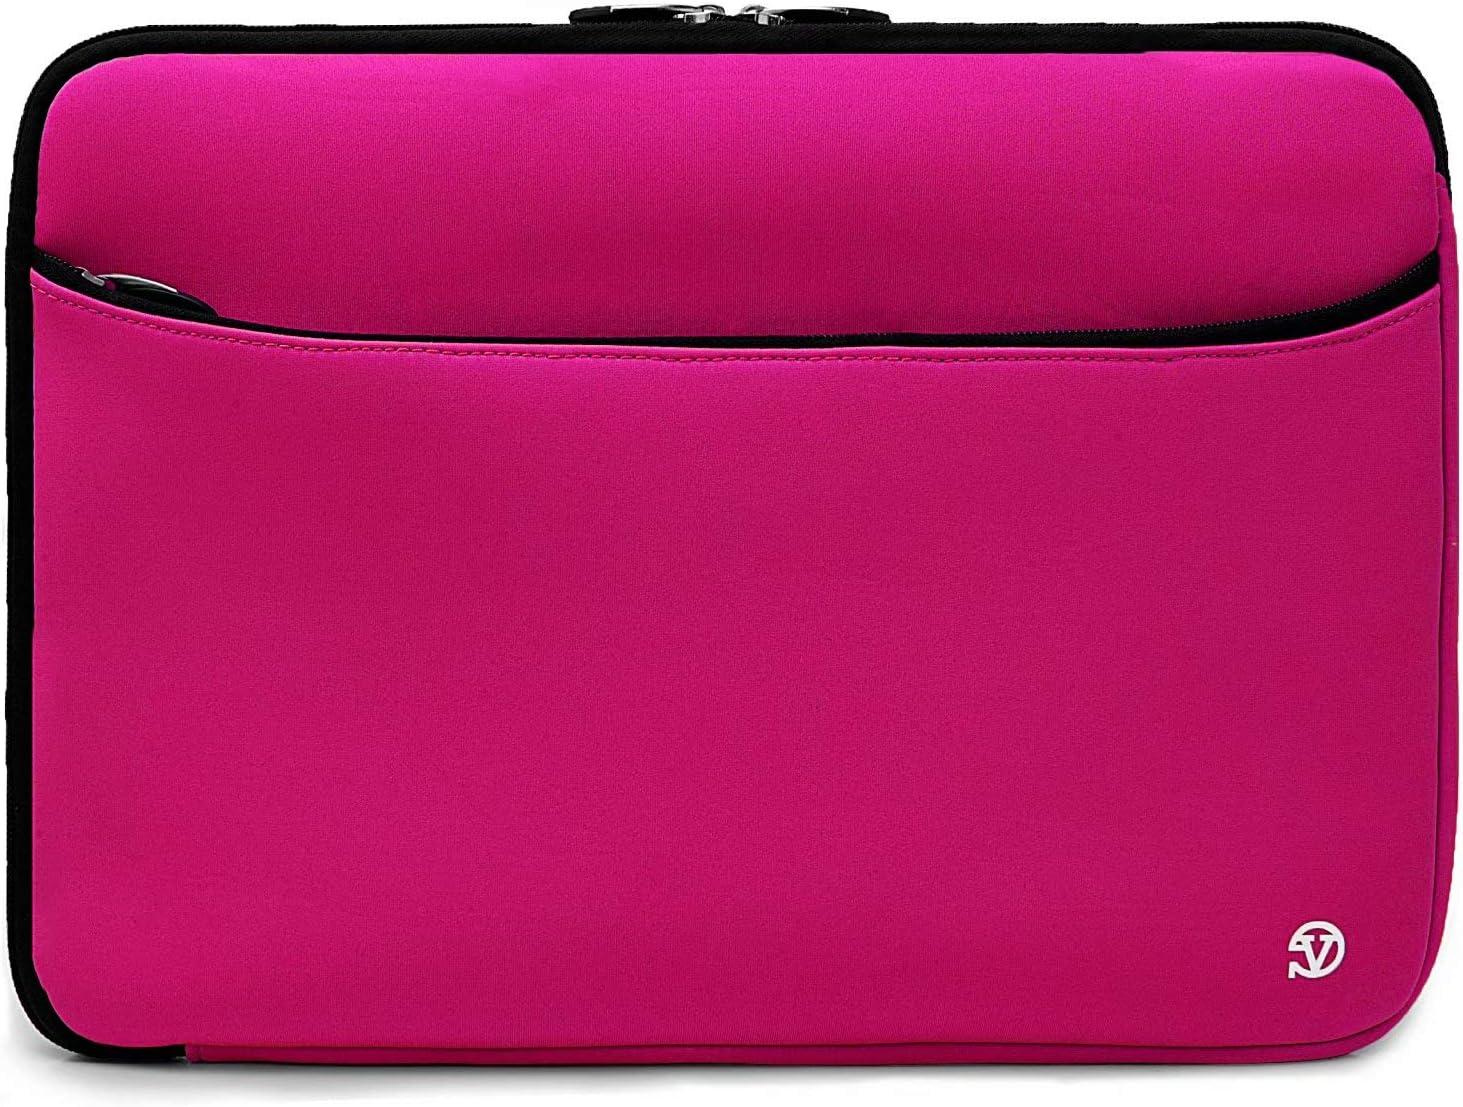 330s T480S N42 Chromebook A485 T480 E490 14W 14e Chromebook 14 Inch Slim Laptop Sleeve Fit for Lenovo ThinkPad L480 IdeaPad 720s E480 E470 E485 330 130 Chromebook S330